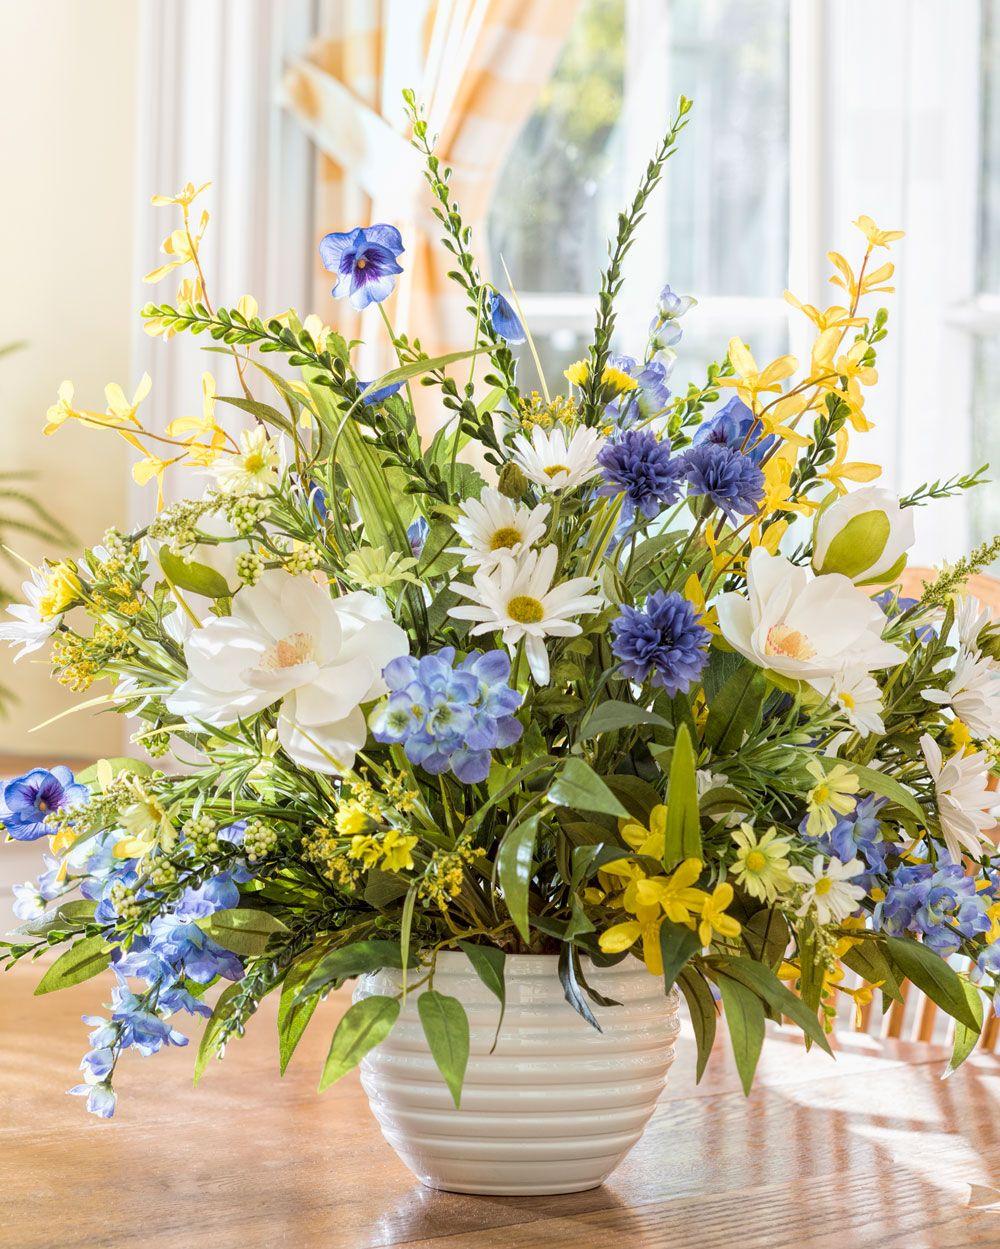 Magnolia Larkspur Daisybrsilk Flower Arrangement Mixed Soft